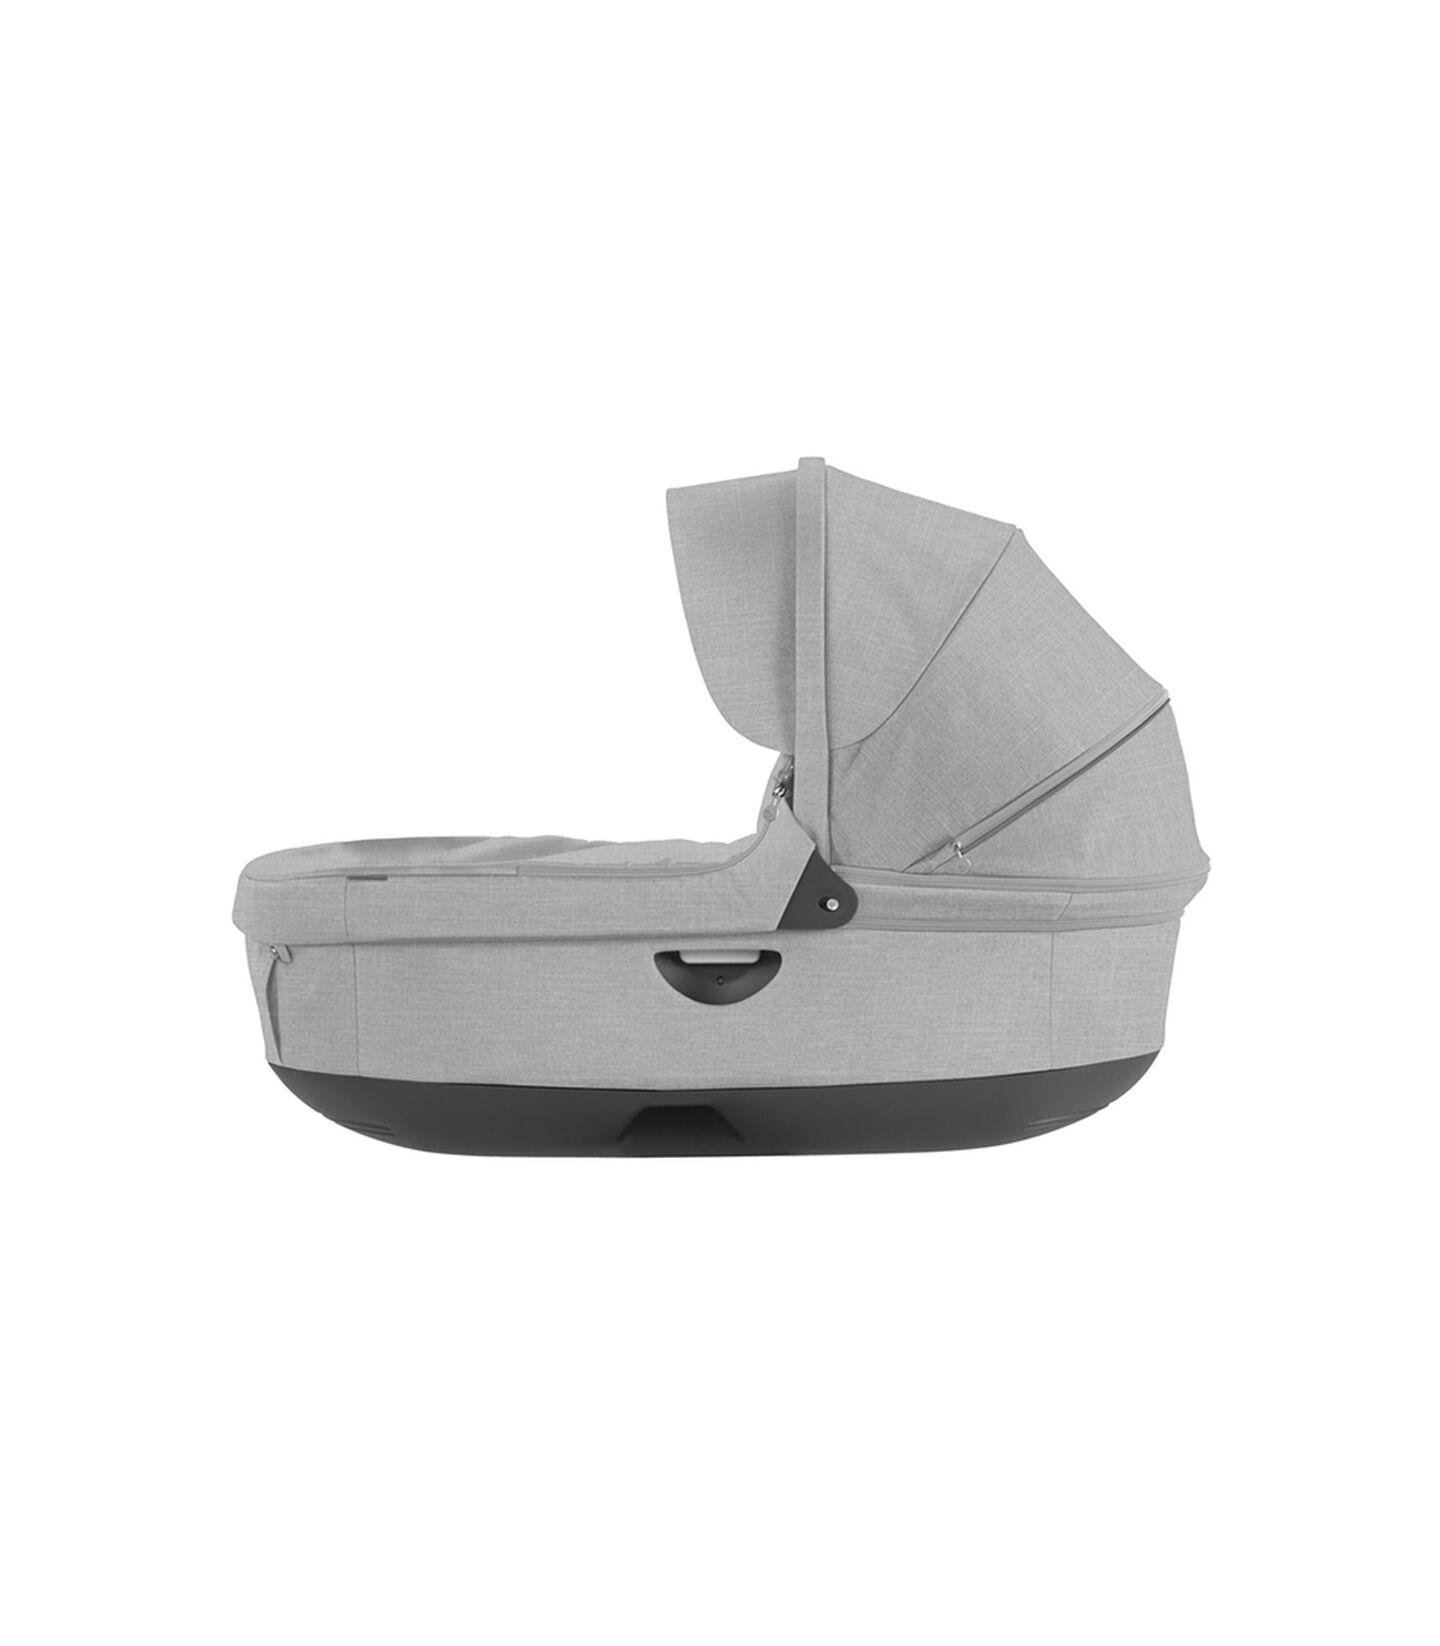 Stokke® Stroller Carry Cot. Grey Melange. (Canopy not included).